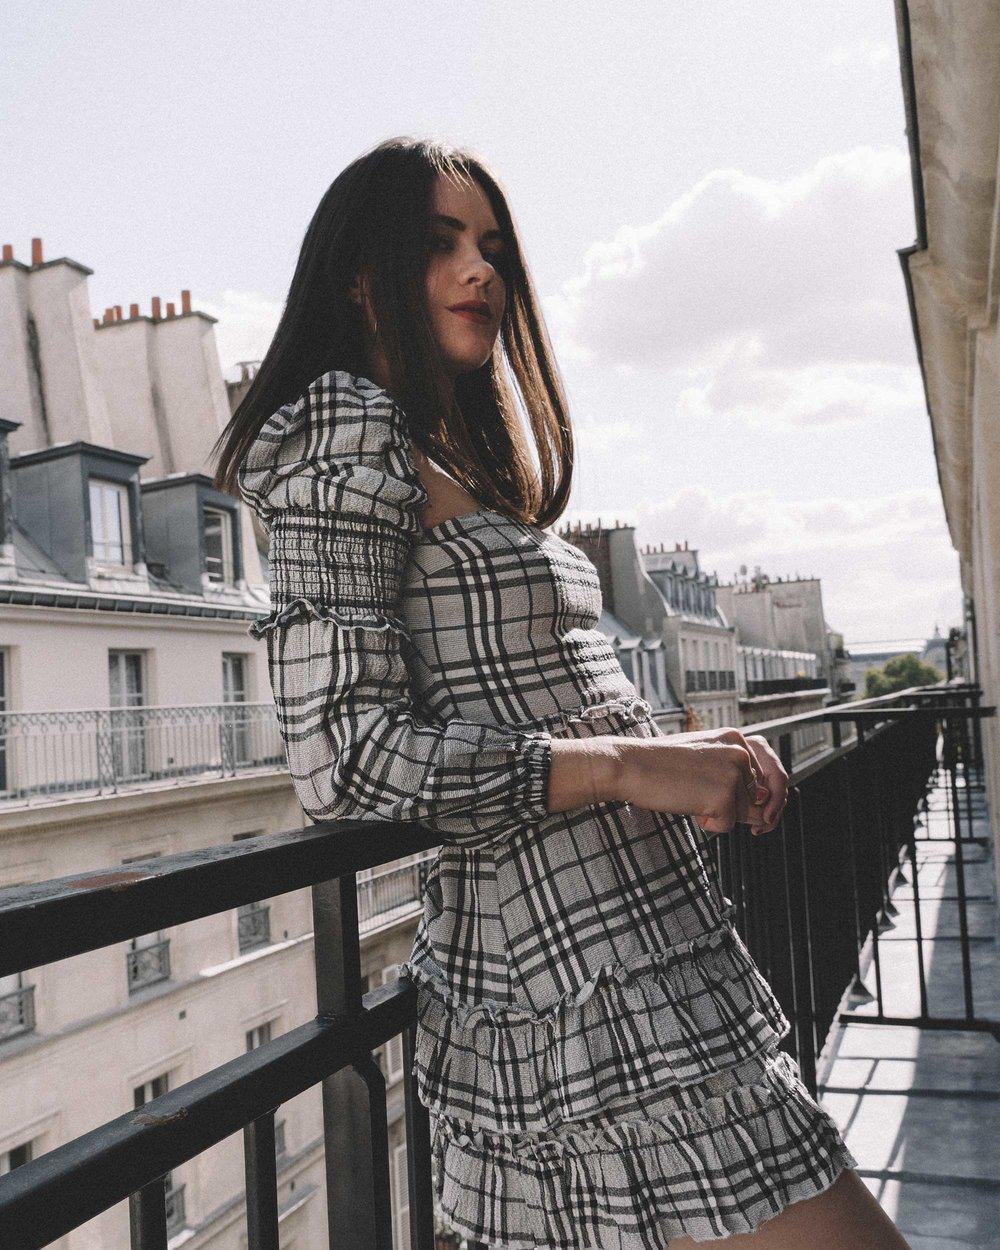 MAJORELLE Plaid Long Sleeve Dress Paris Girl Balcony Outfit5.jpg